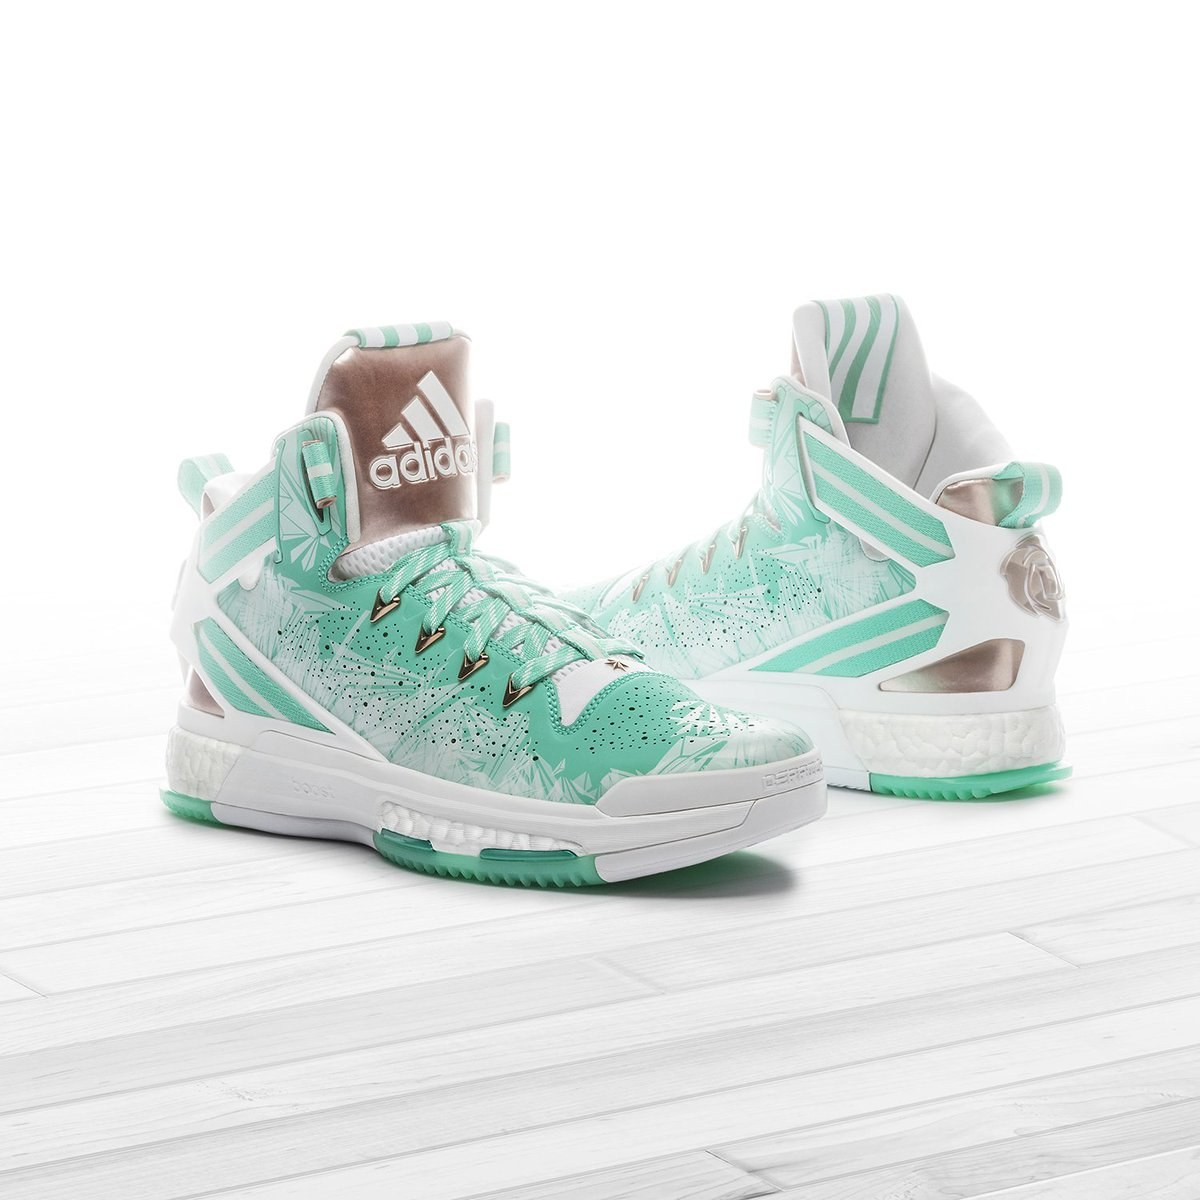 finest selection 6a1a9 8b70e adidas Basketball on Twitter